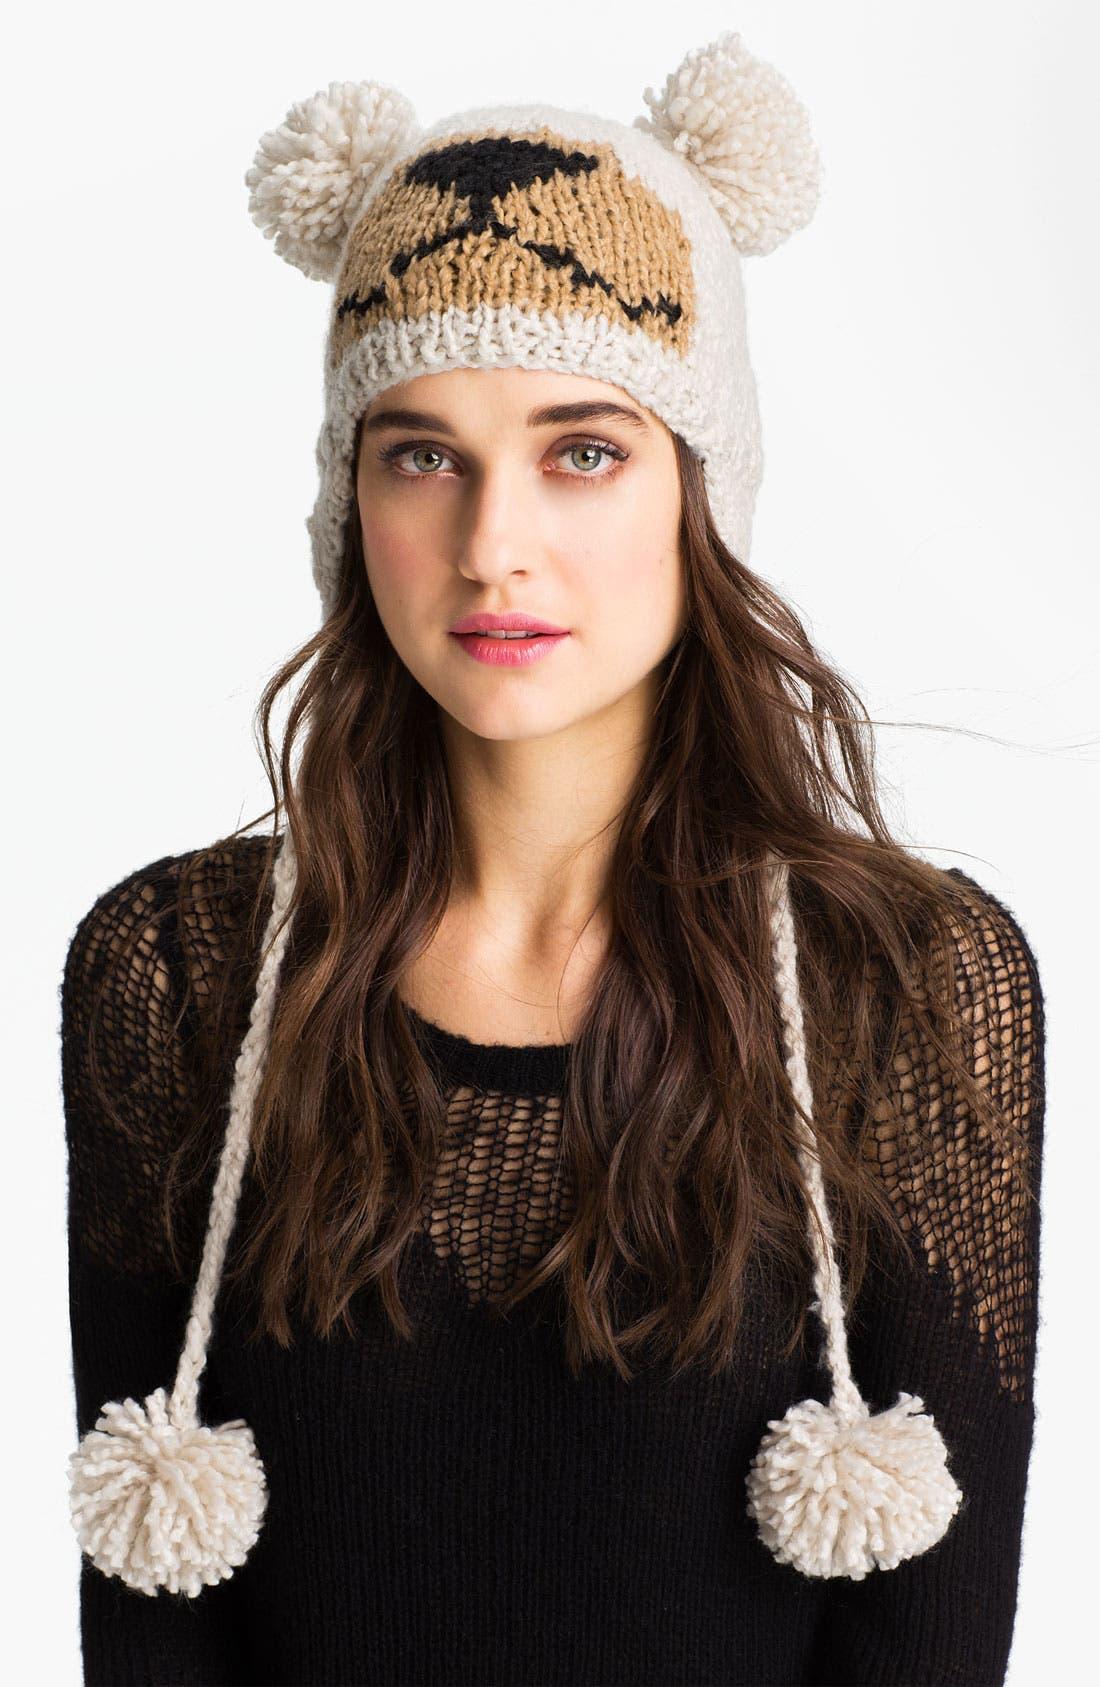 Alternate Image 1 Selected - Made of Me Accessories 'Yogi - Heidi' Hat